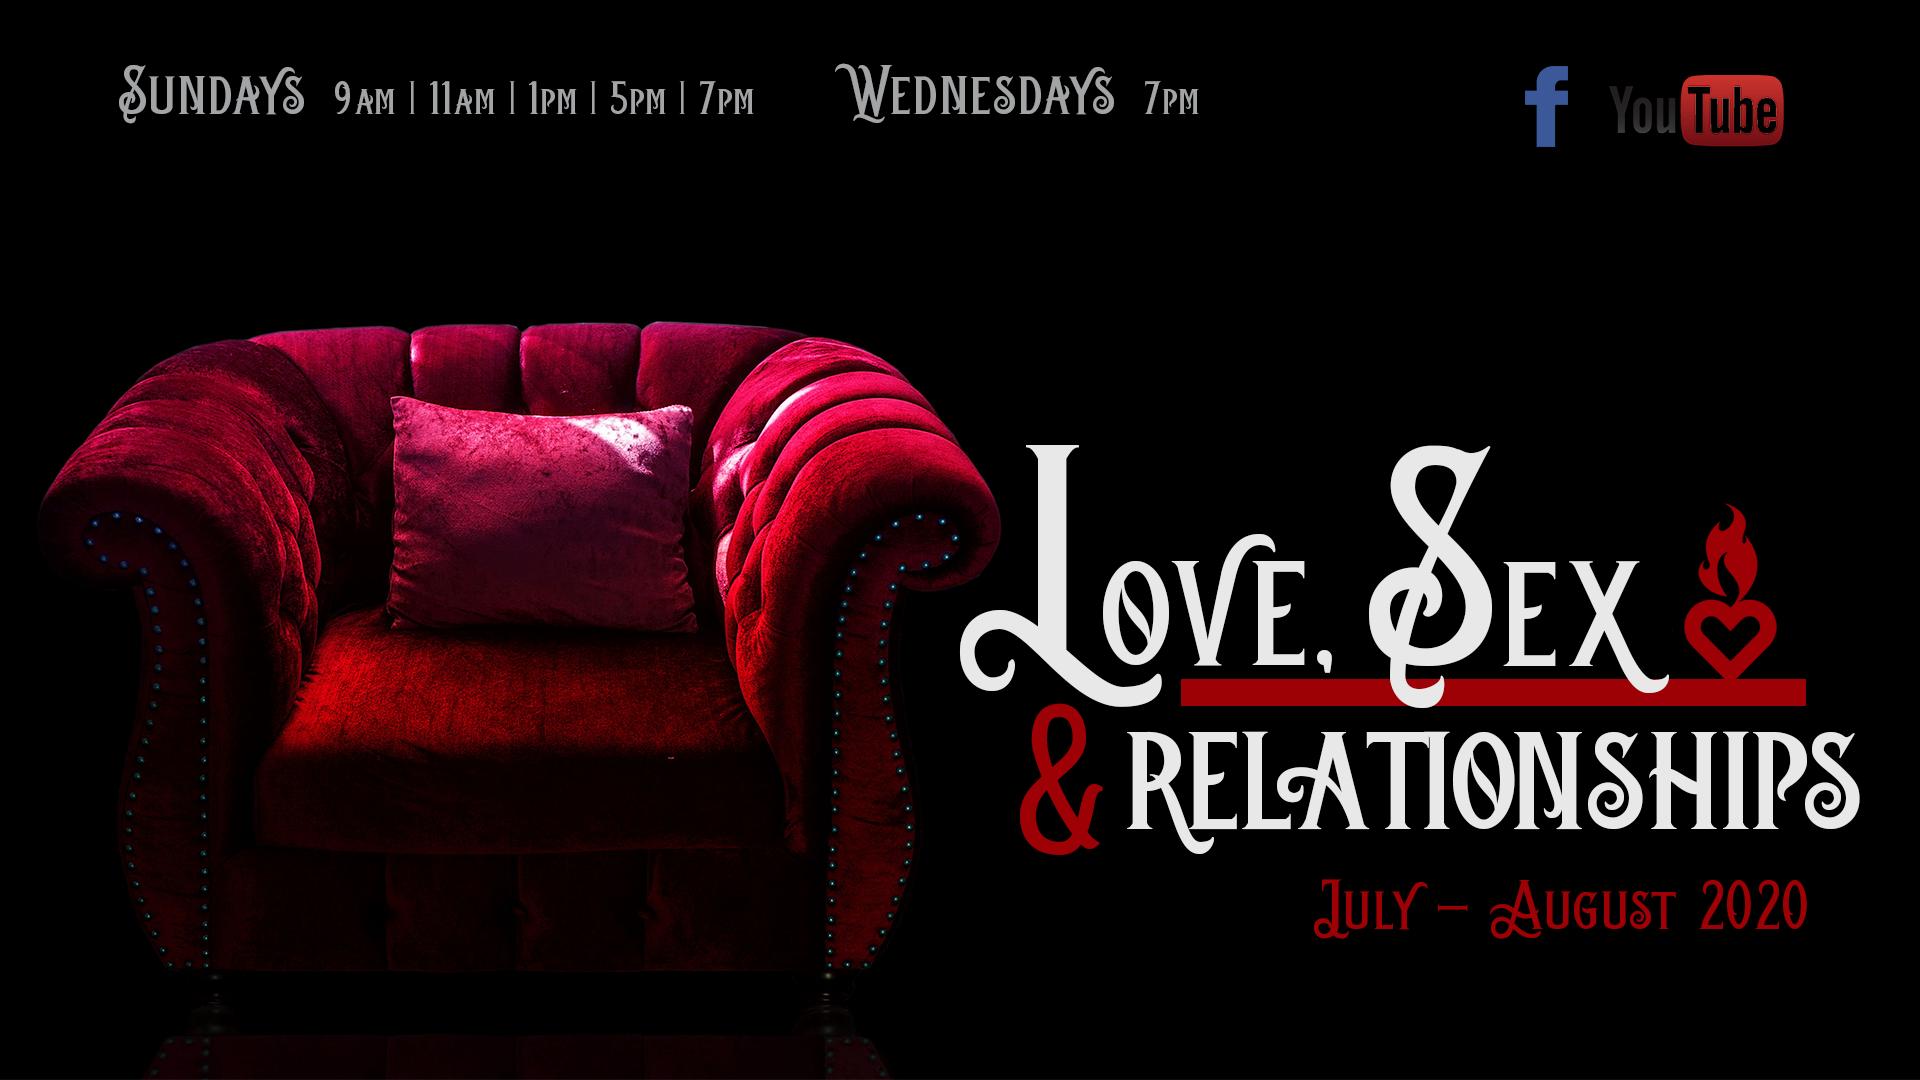 Love, Sex & Relationships!